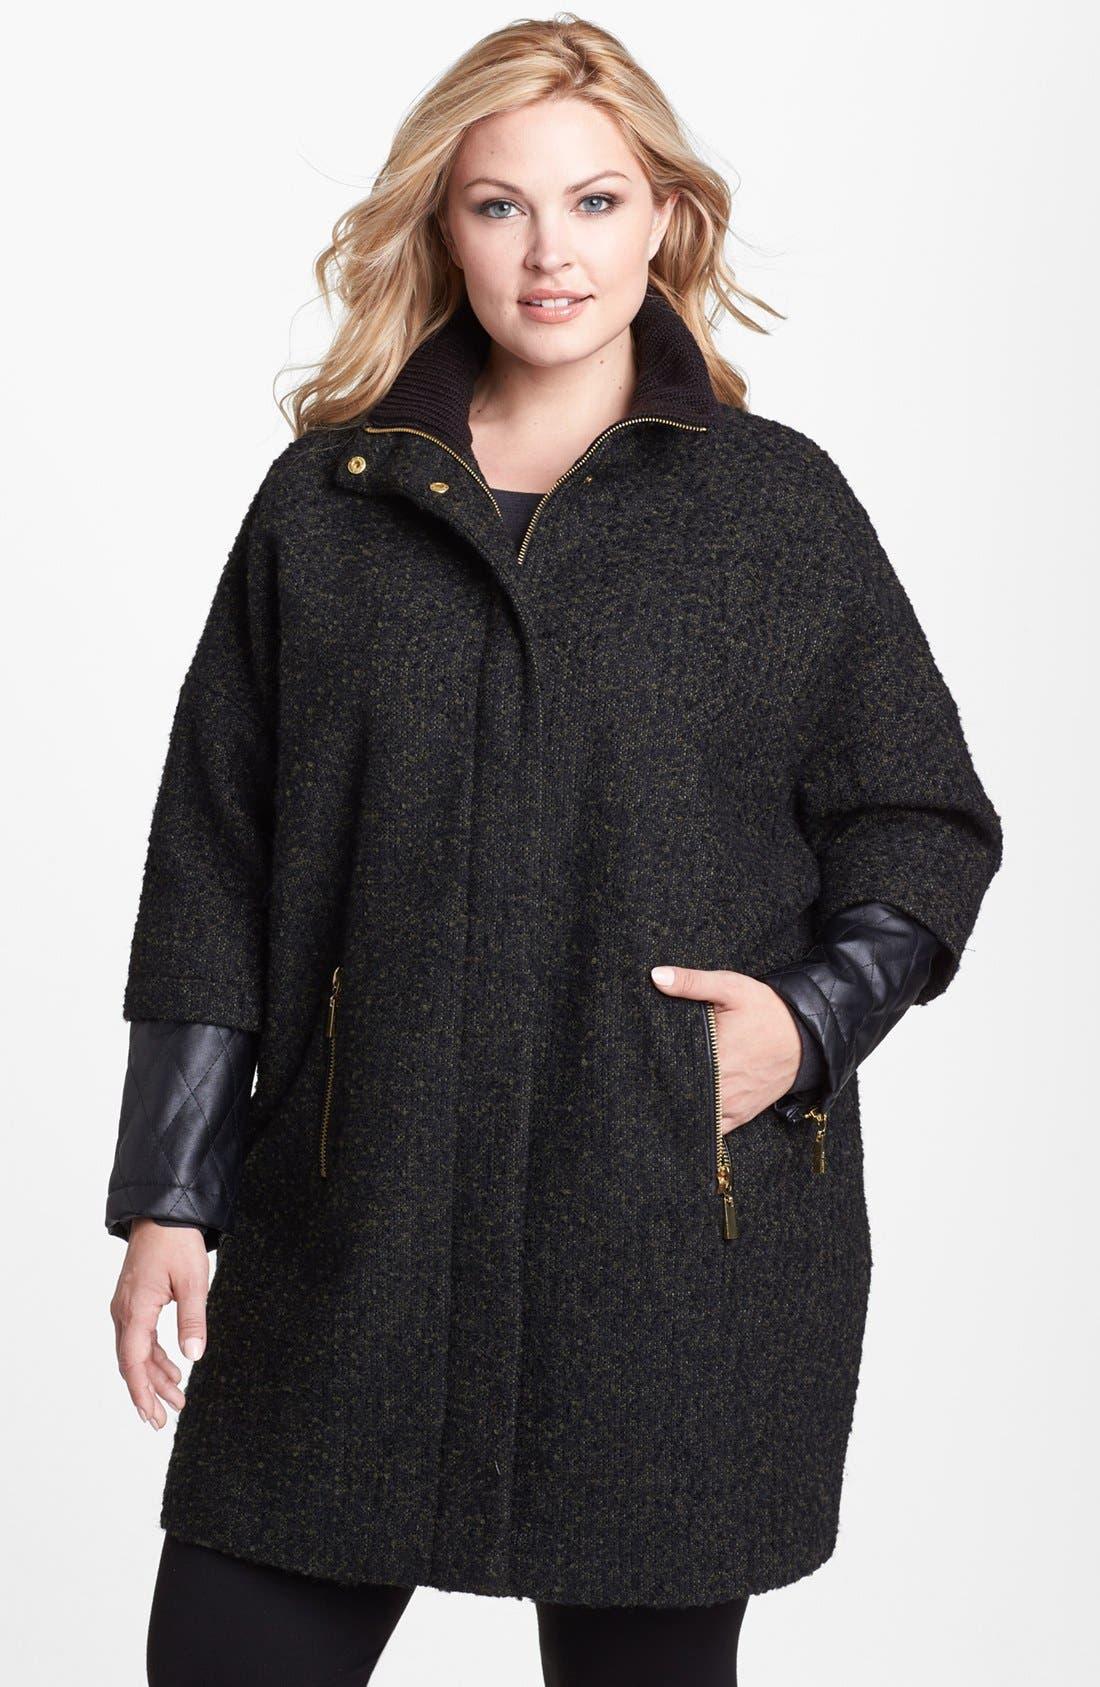 Main Image - Vince Camuto Faux Leather Sleeve Bouclé Tweed Coat (Plus Size)